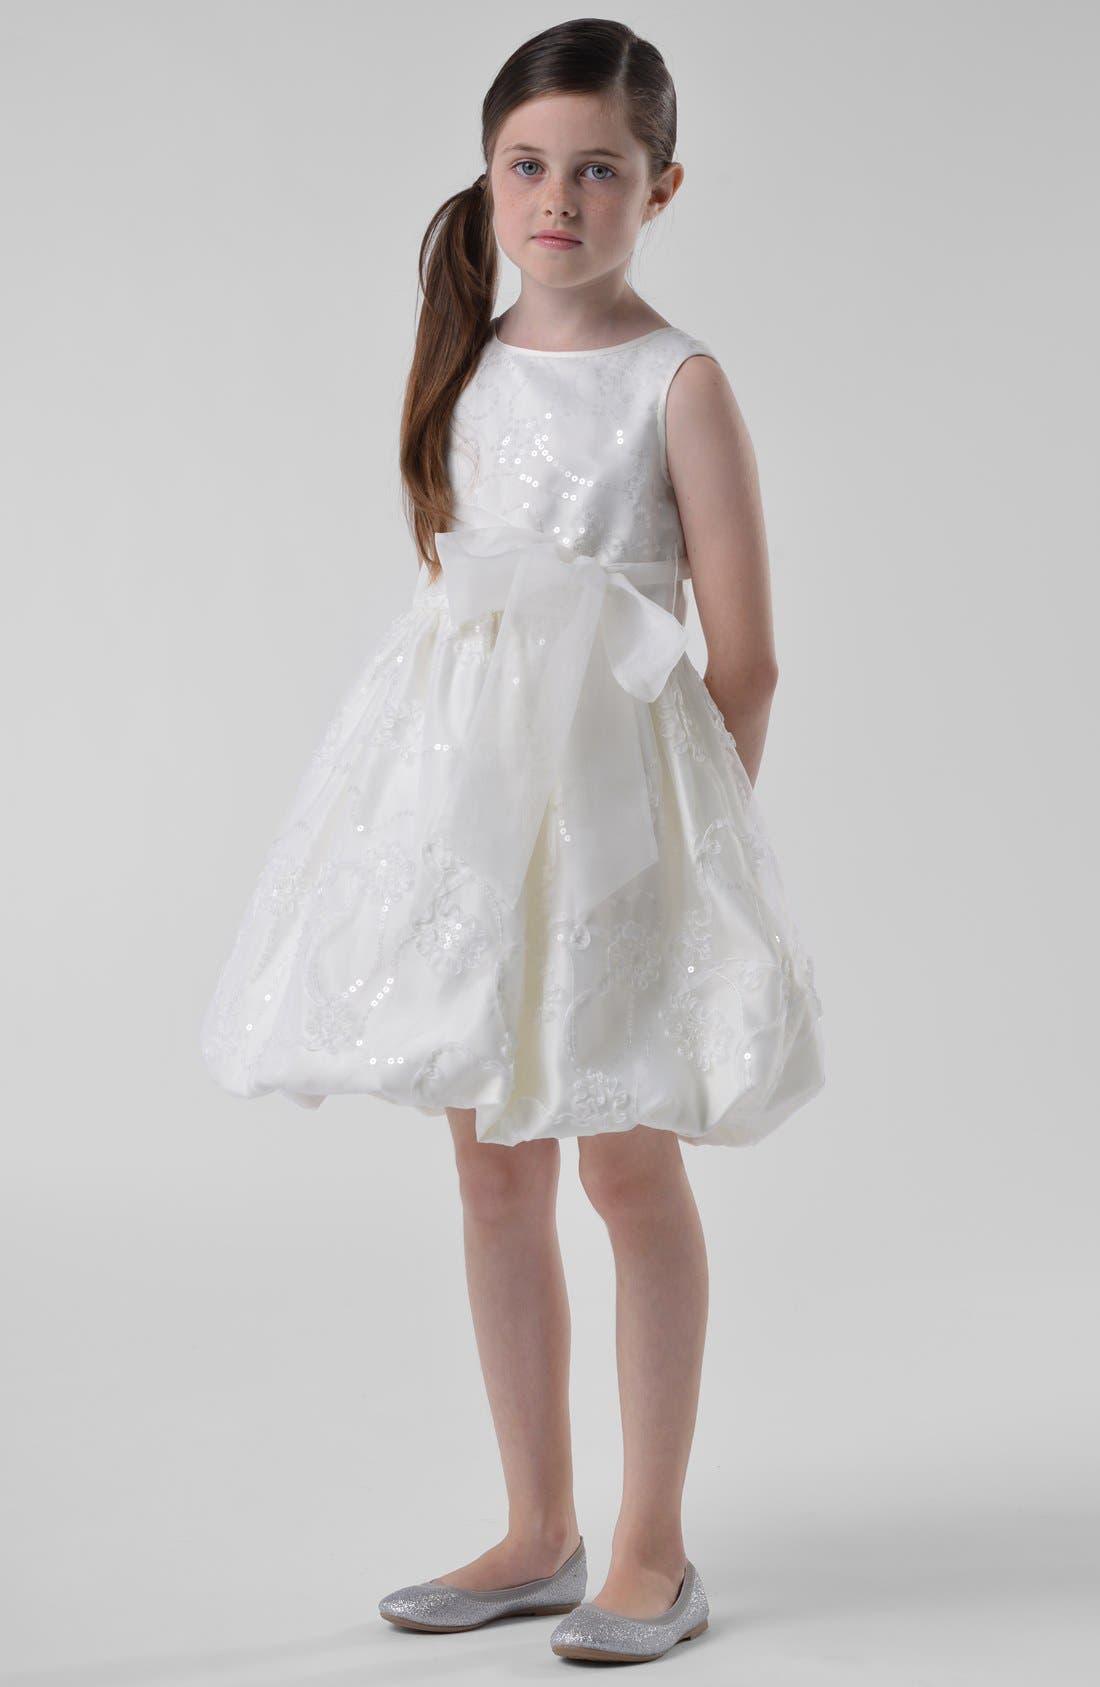 Alternate Image 1 Selected - Us Angels Embroidered Organza Dress (Little Girls & Big Girls)